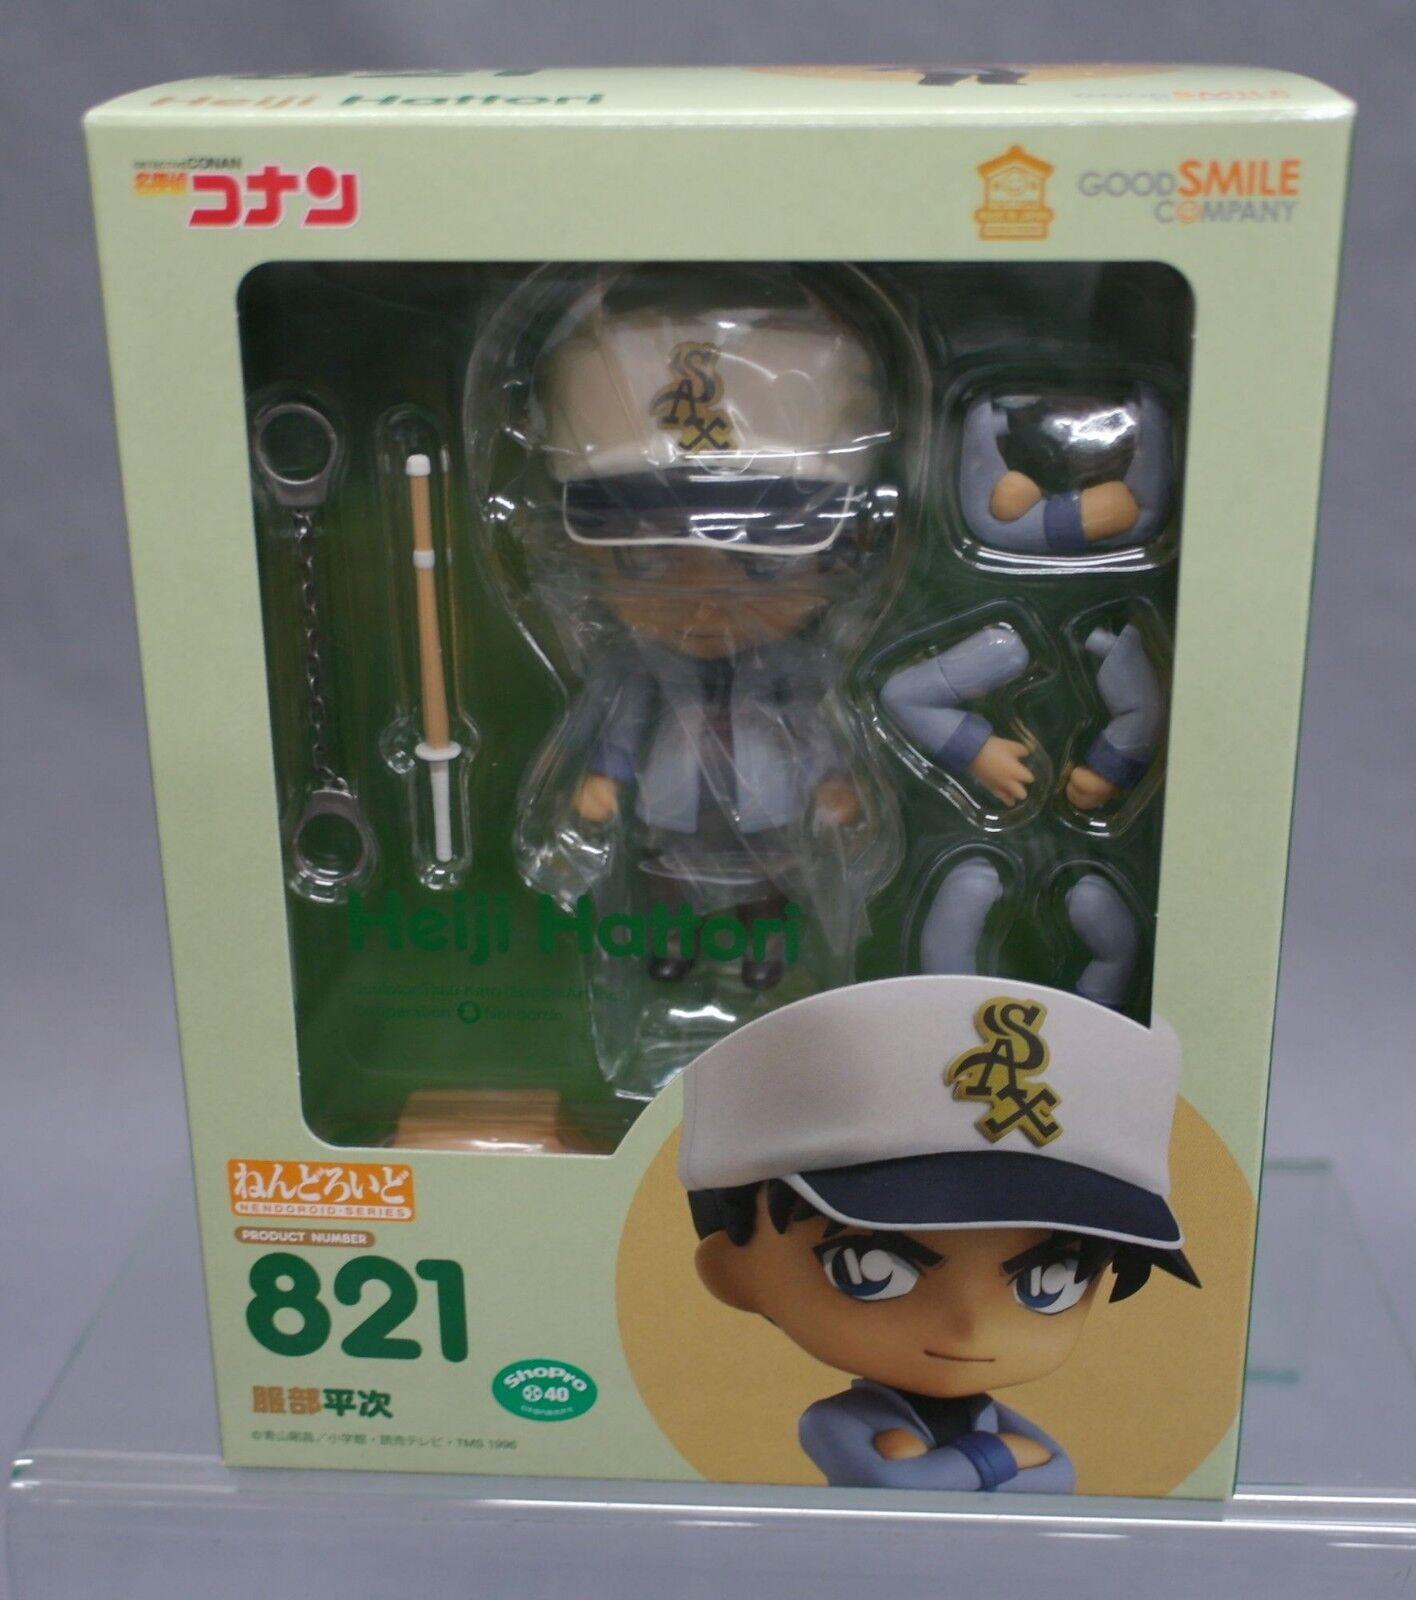 Nendoroid Detective Conan Heiji Hattori Good Smile azienda Japan  nuovo  outlet online economico